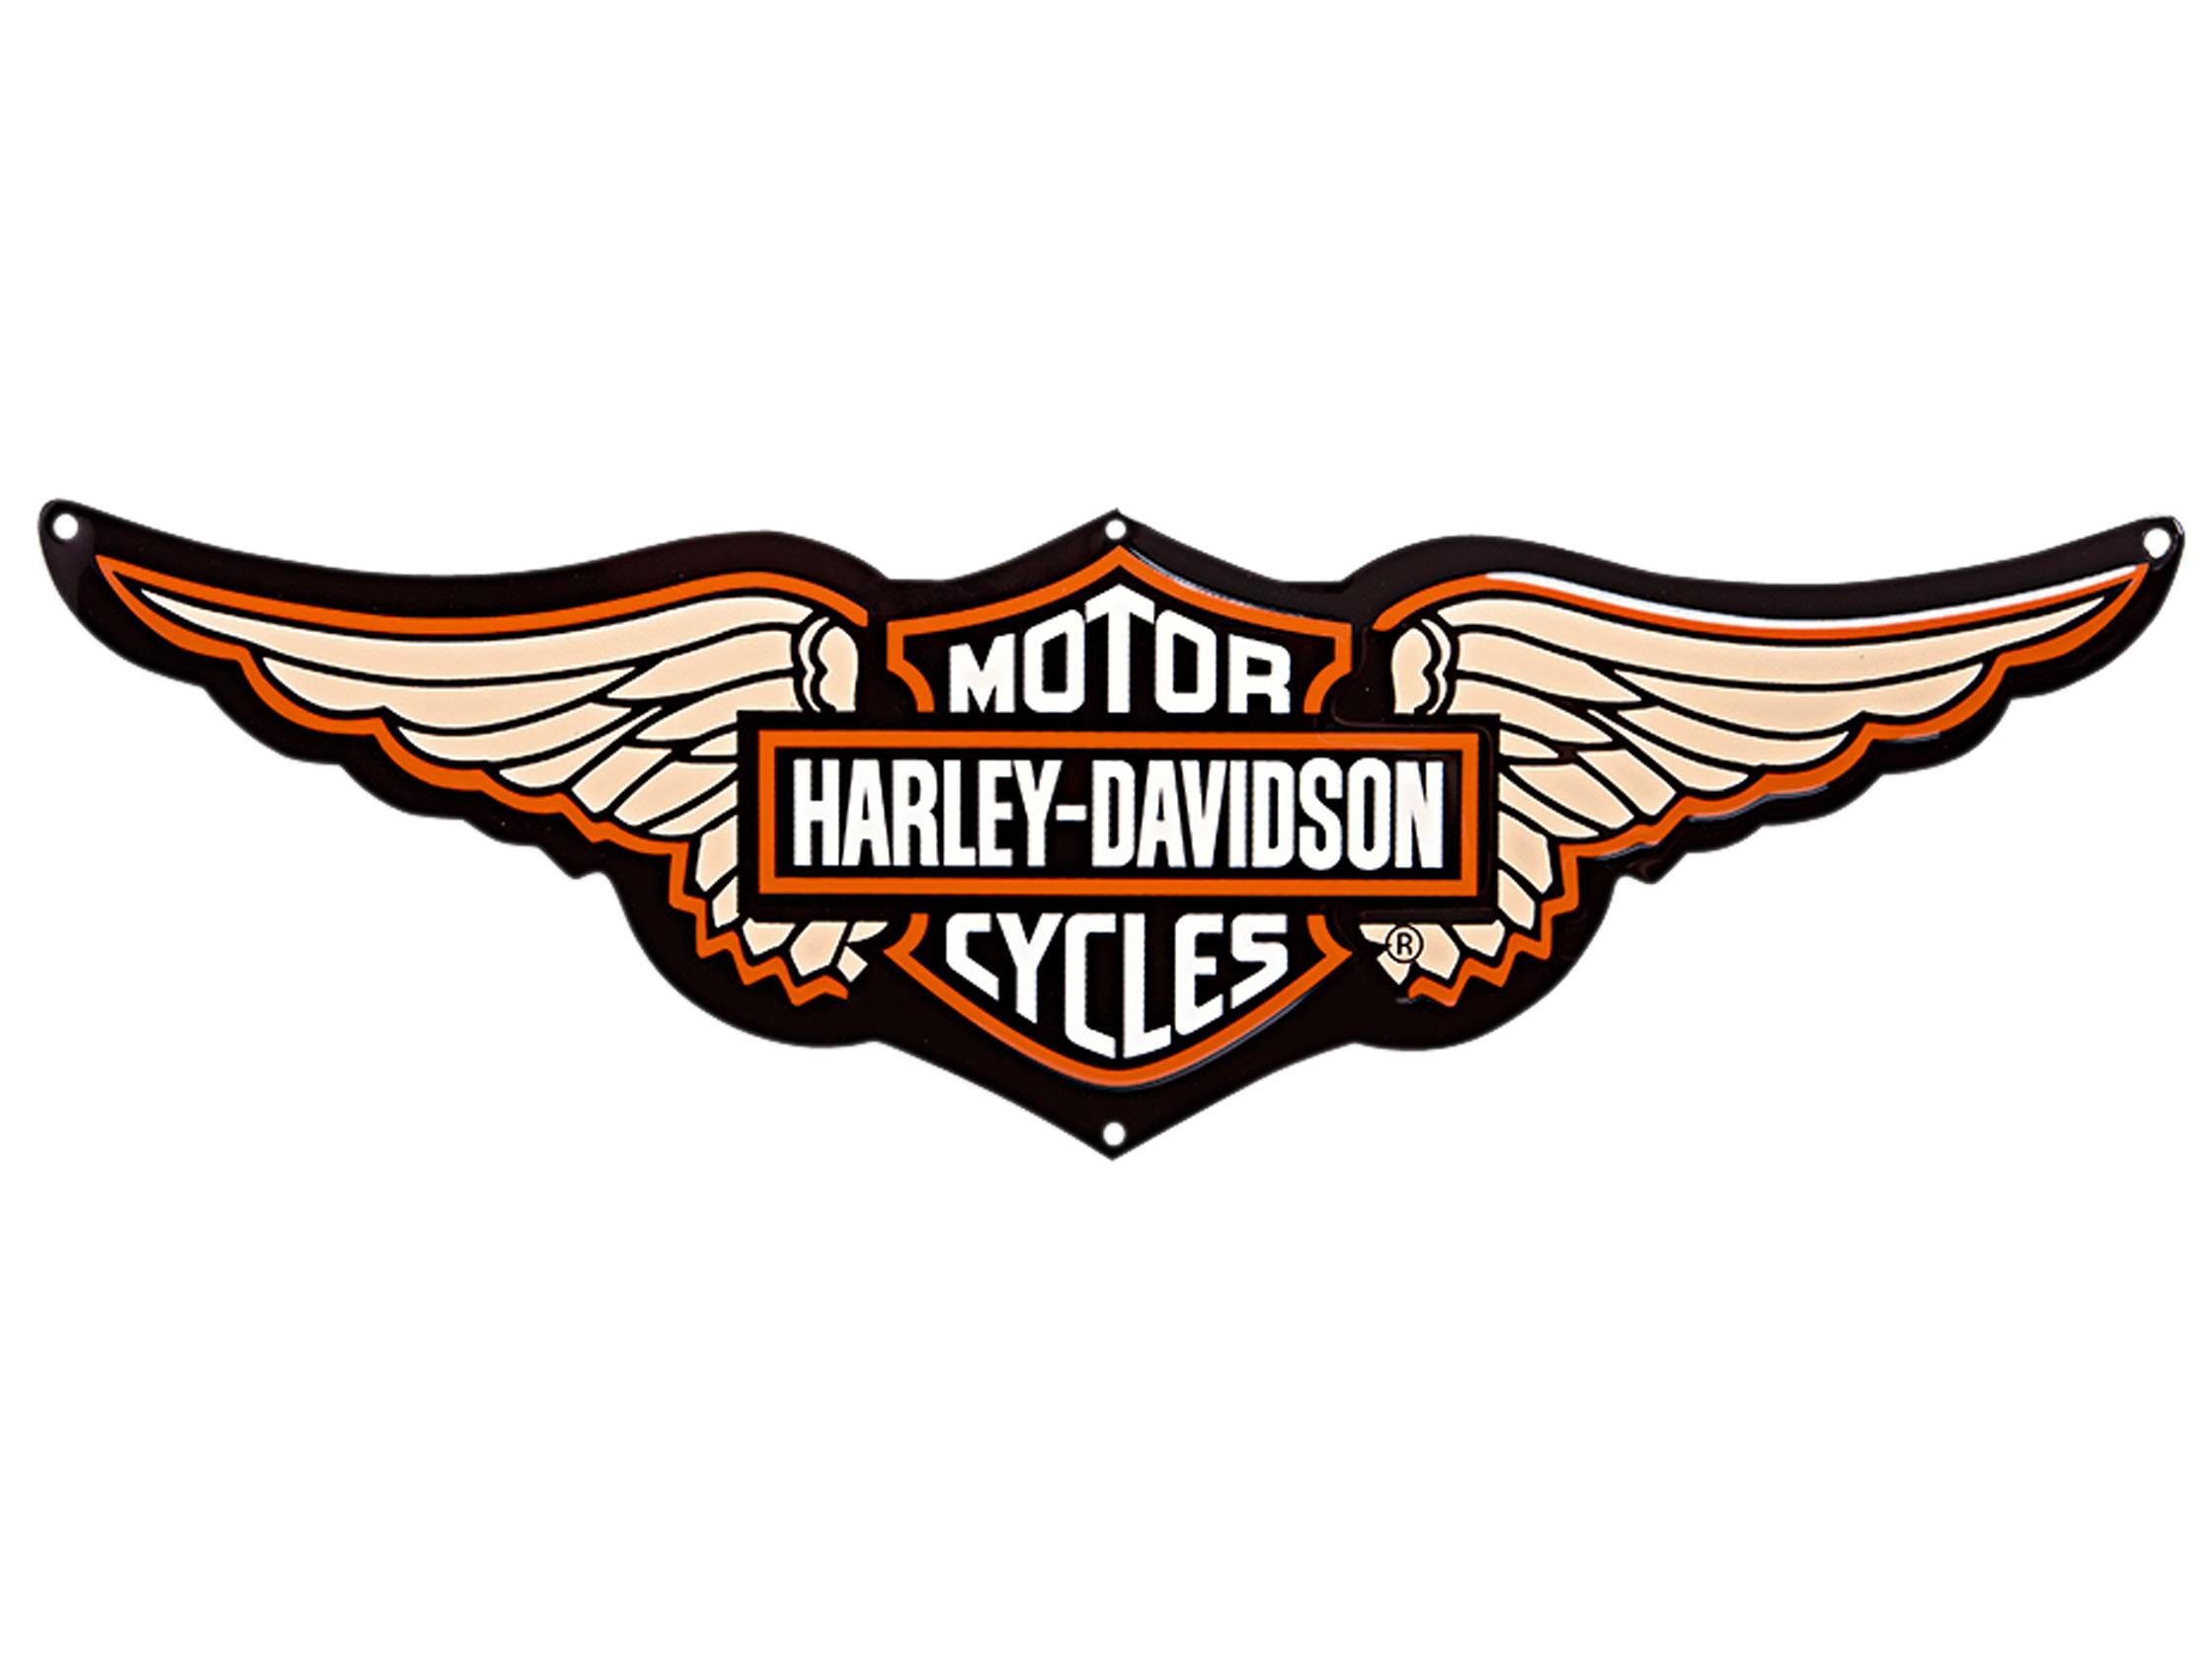 2240x1680 Harley Davidson Free Motorcycle Harley Clipart 3